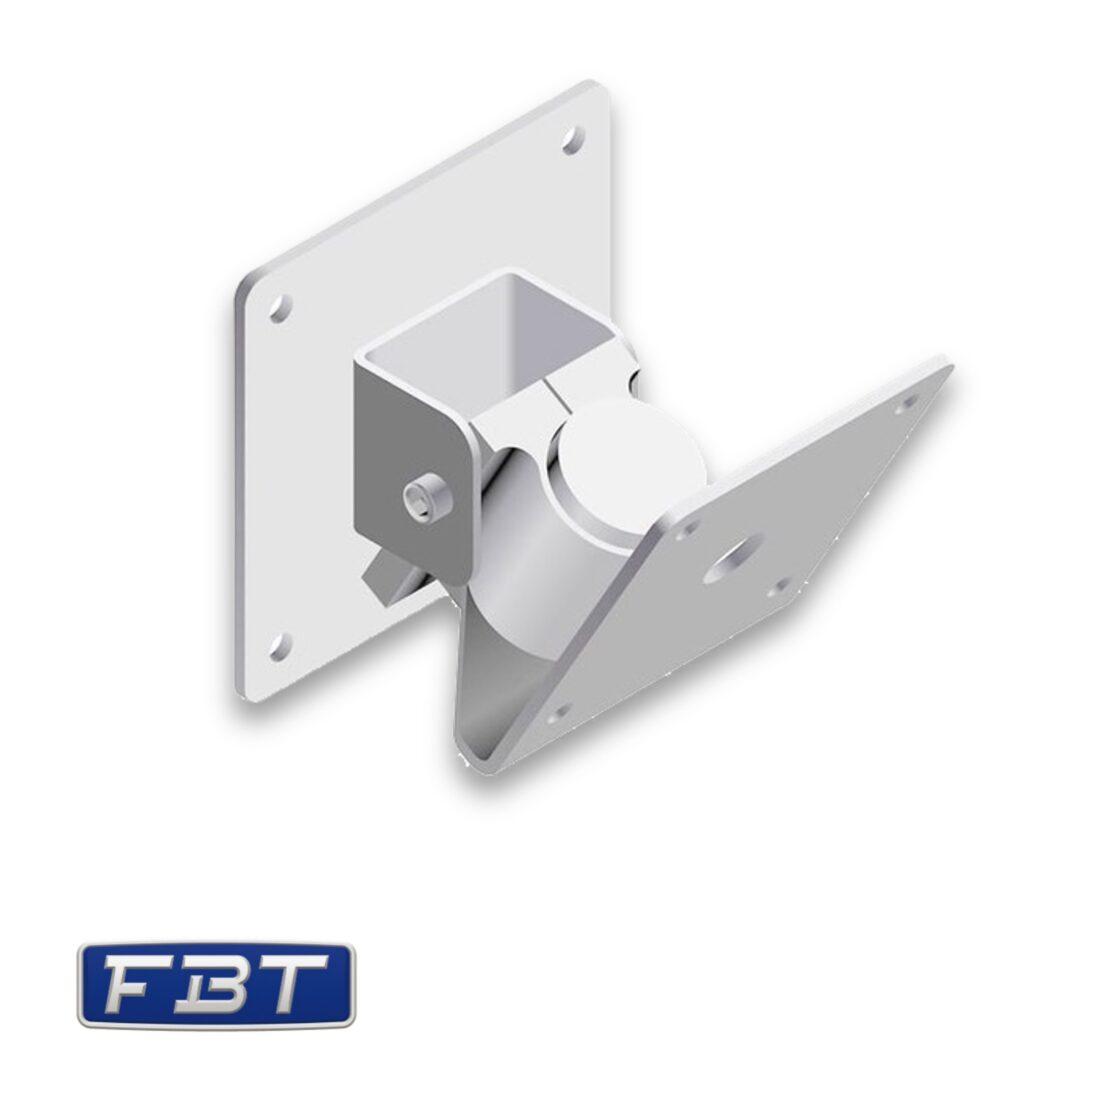 FBT directional bracket white